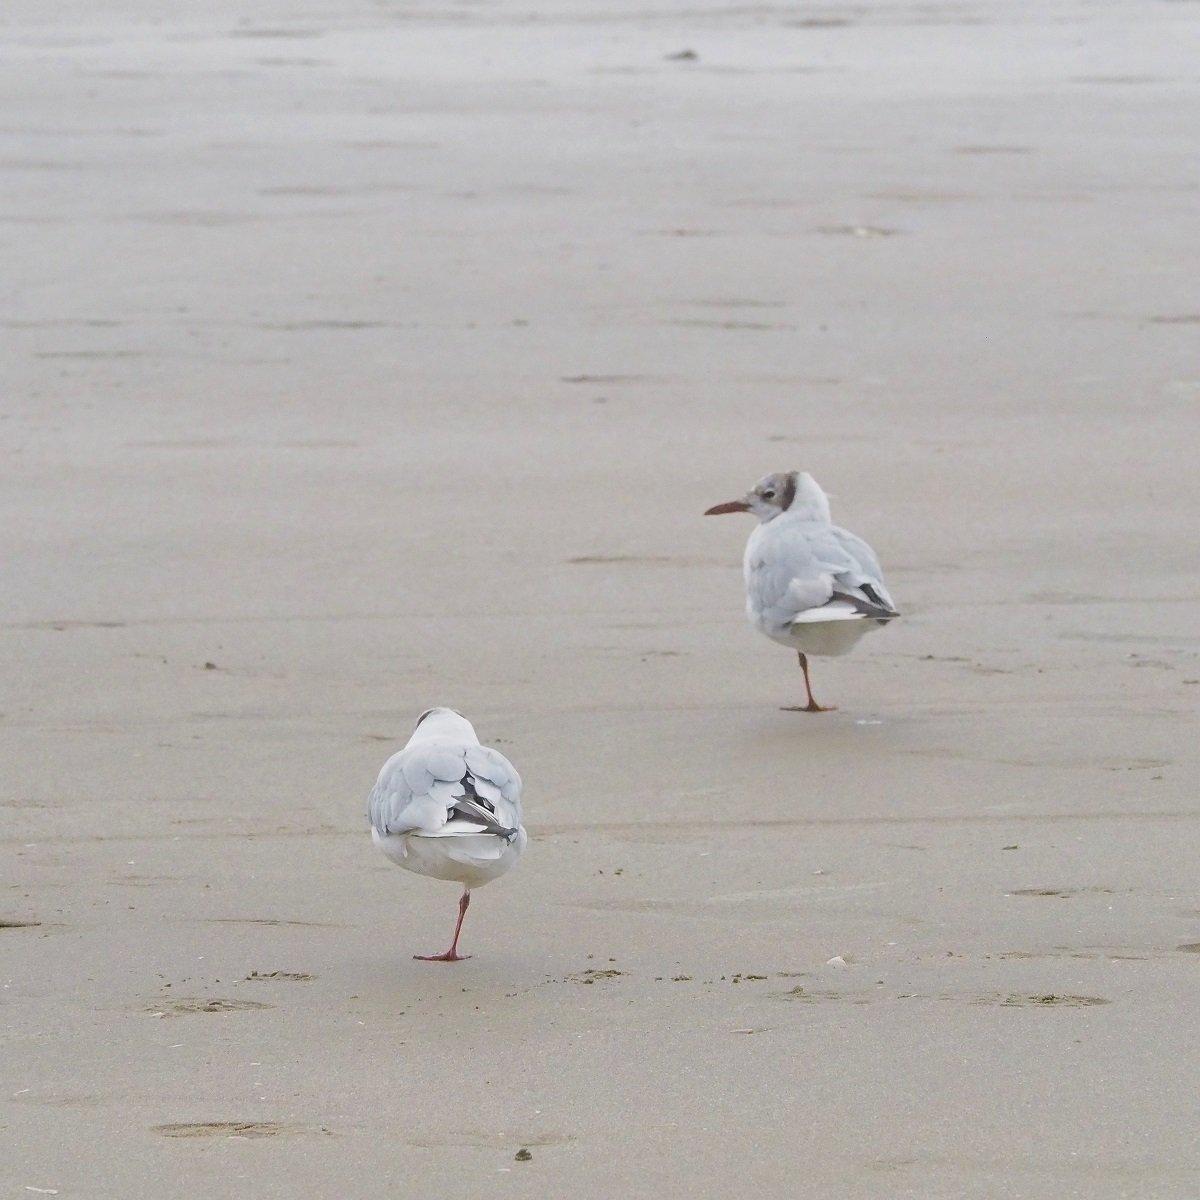 Foto: 2 Möwen am Strand